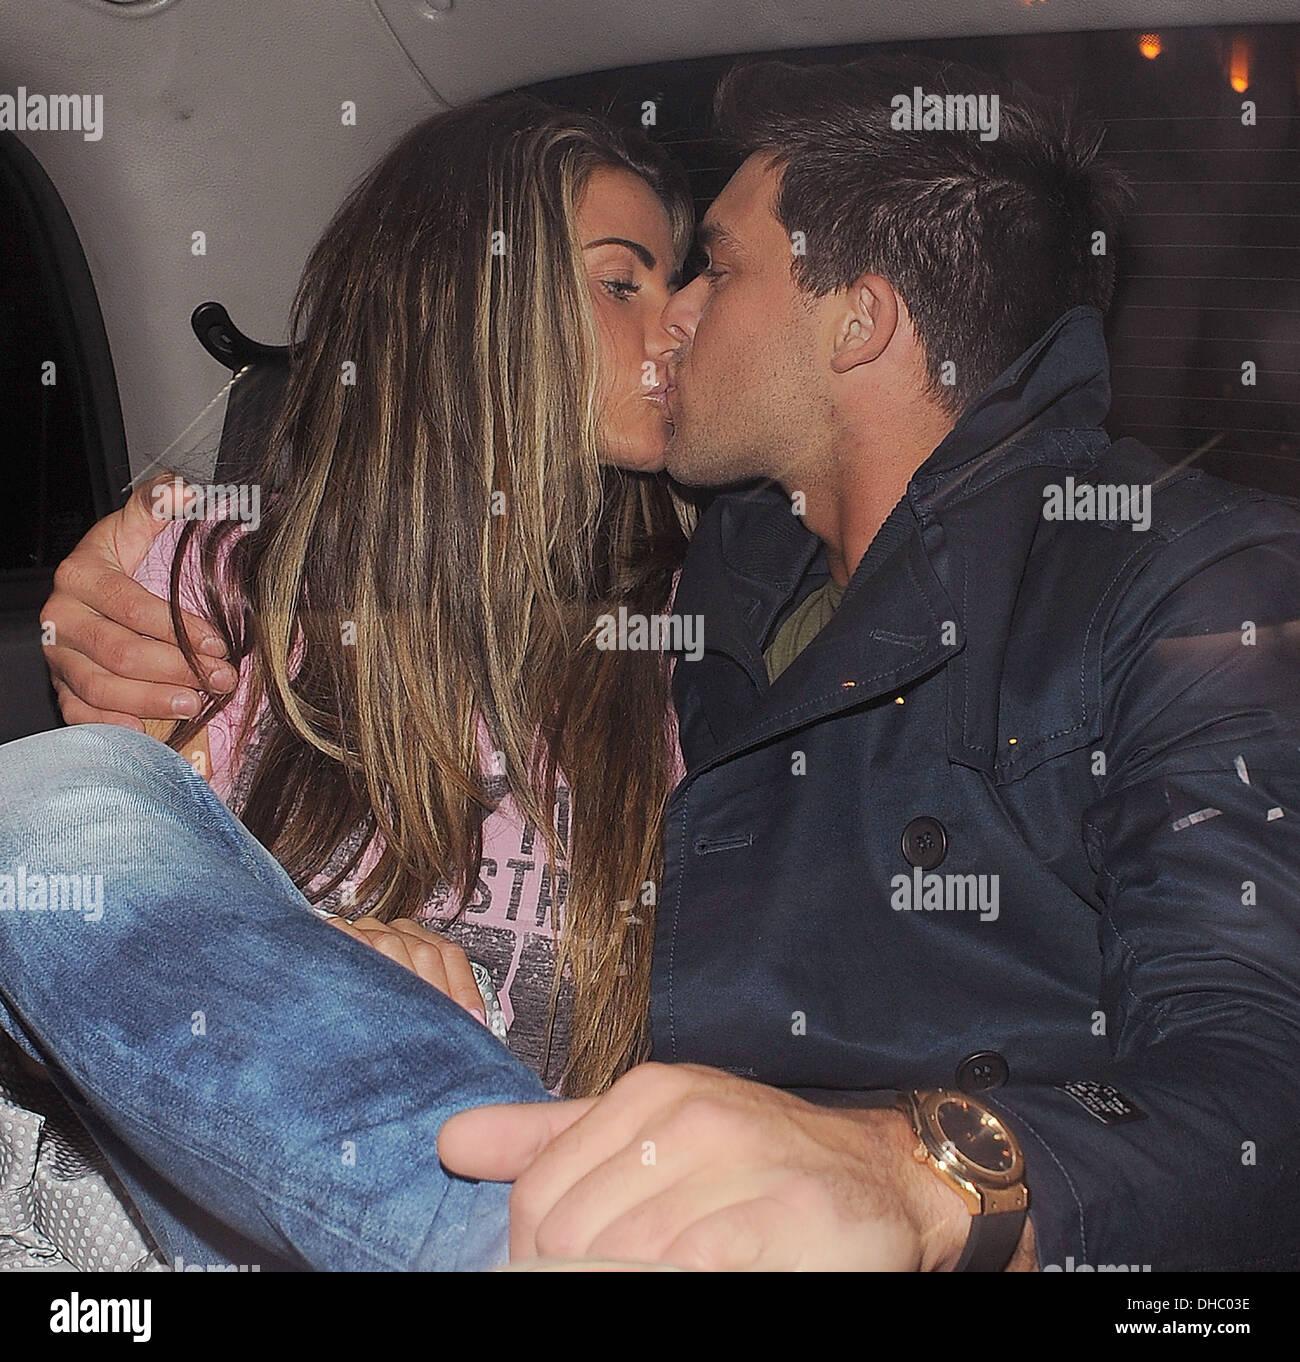 Katie Price Aka Jordan And Her Boyfriend Leandro Penna Hug And Kiss Stock Photo Alamy